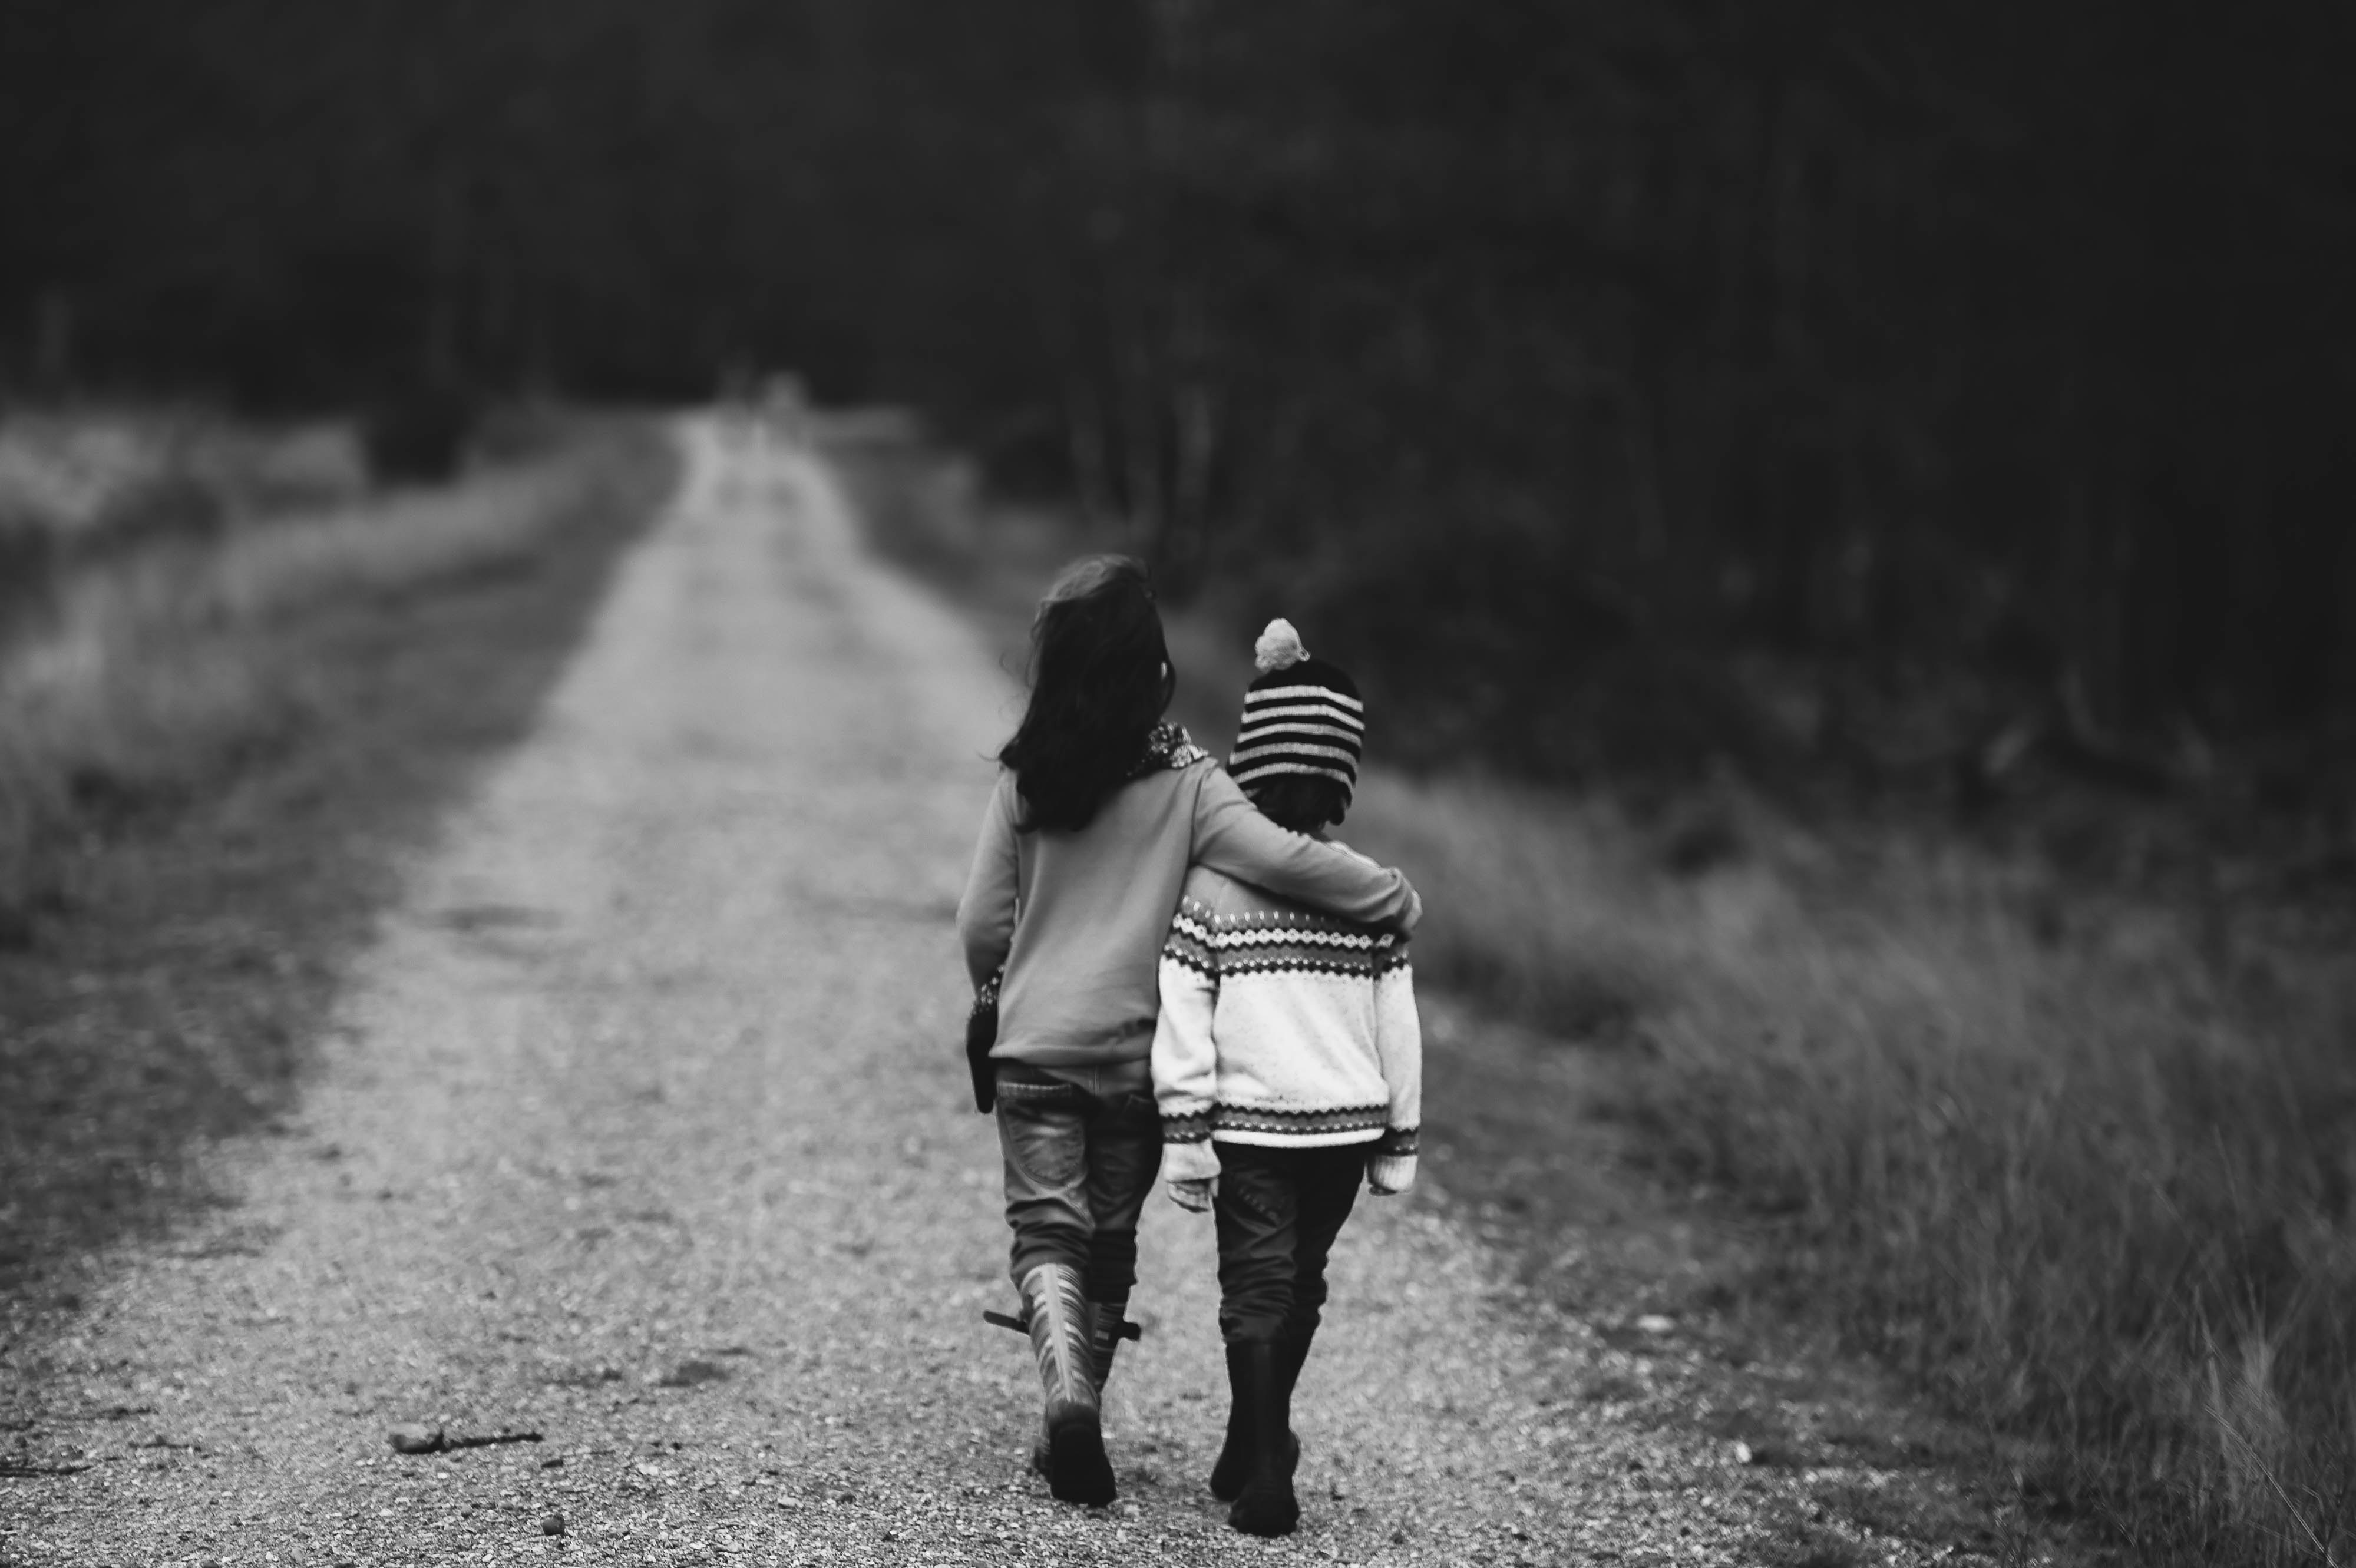 La empatía, un valor que se educa